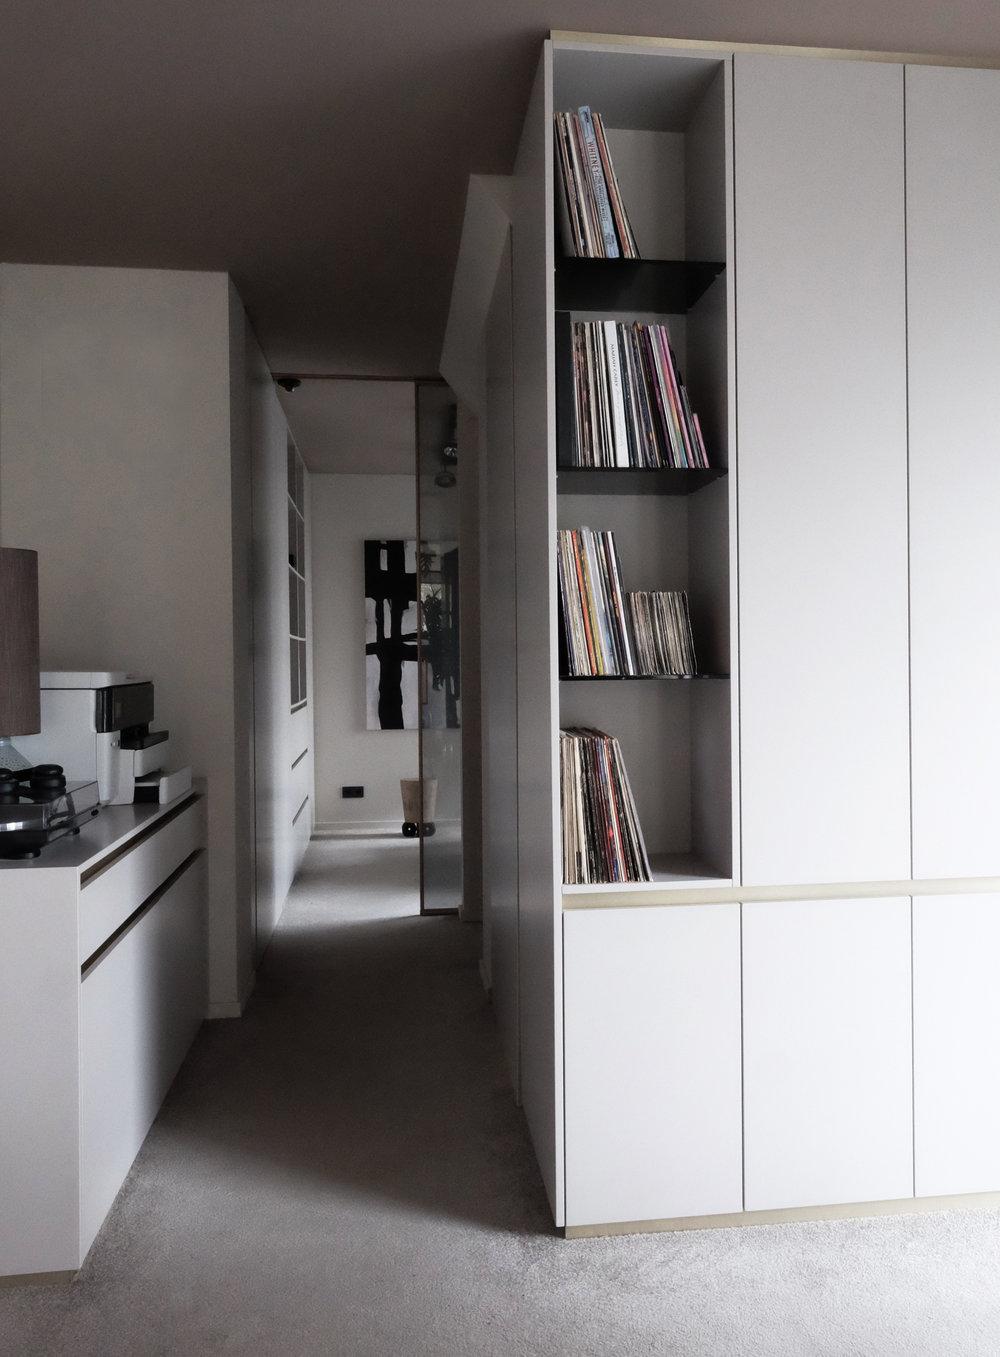 004 studio lex de gooijer interiors Rotterdam.jpg